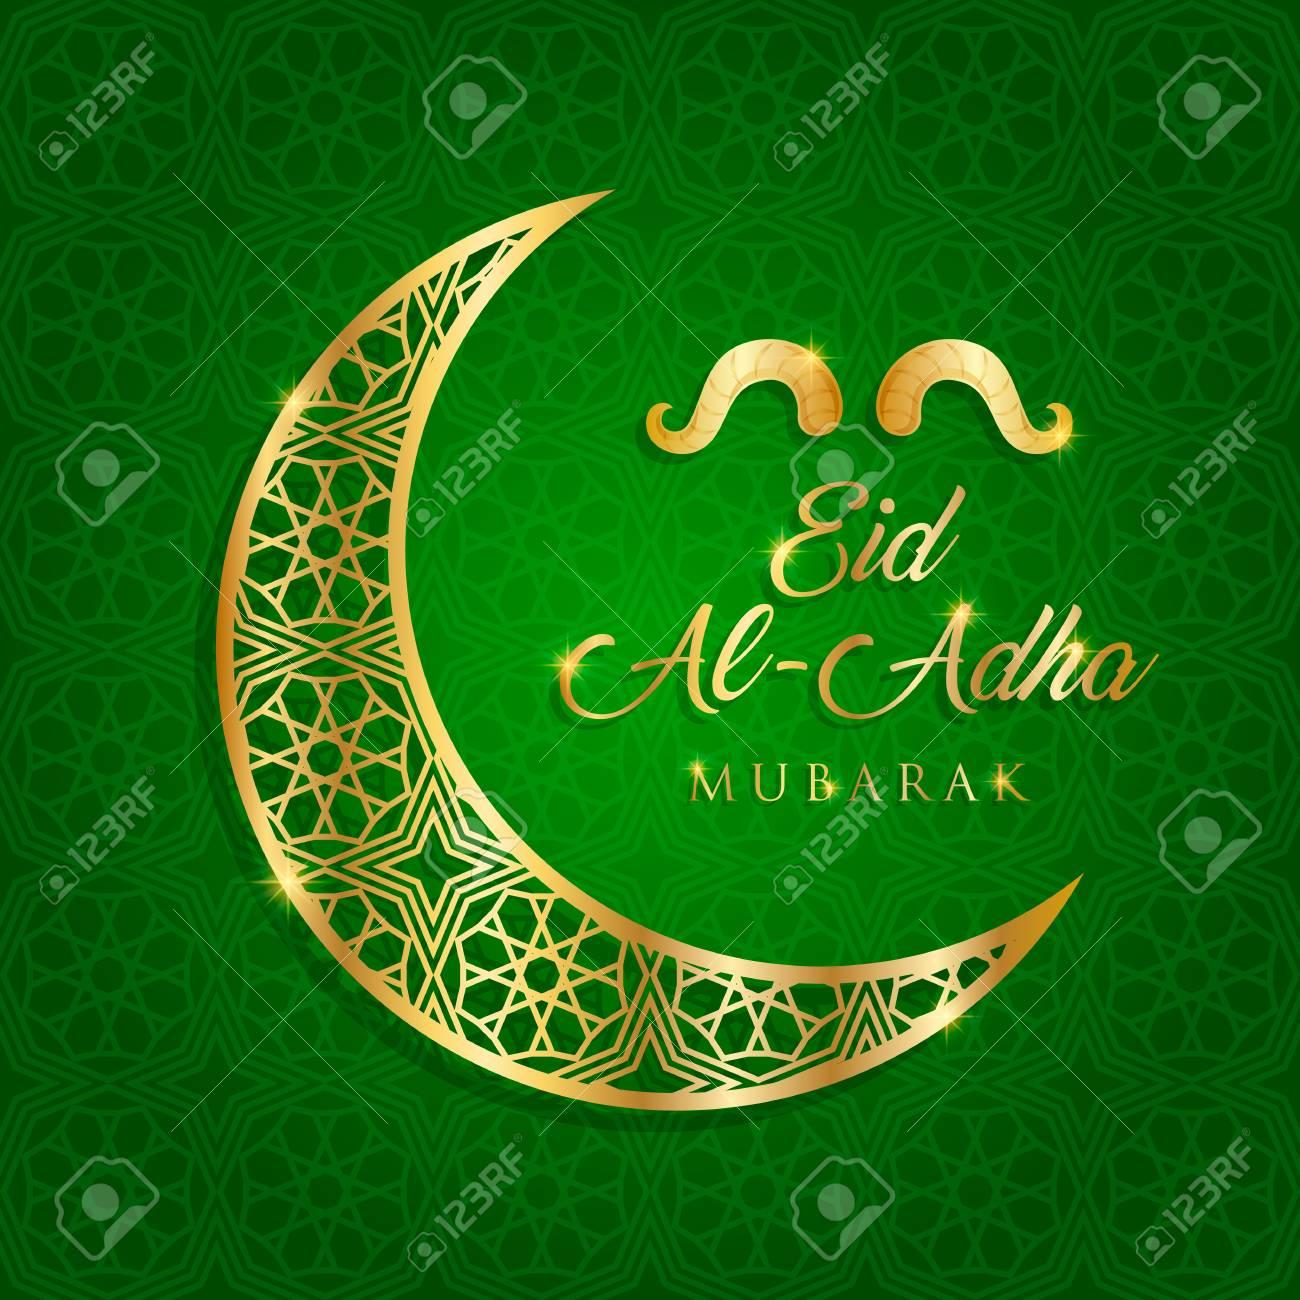 Islamic festival of sacrifice eid al adha mubarak greeting card islamic festival of sacrifice eid al adha mubarak greeting card vector illustration m4hsunfo